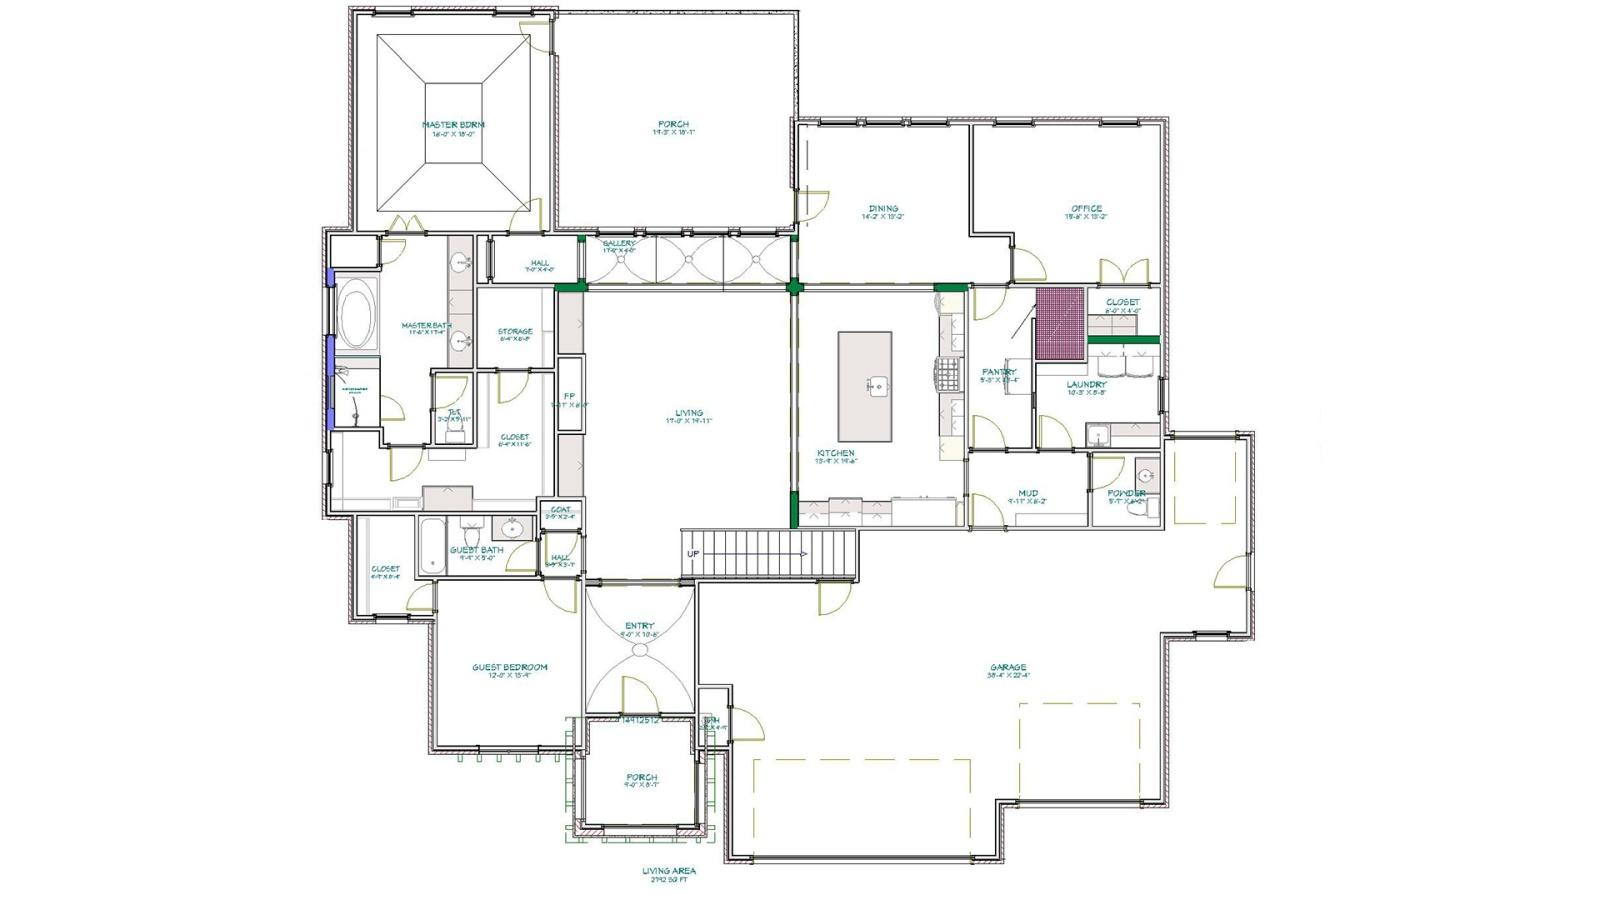 4 Bedrooms Bedrooms, ,4 BathroomsBathrooms,Custom Home,Home Plans,1059